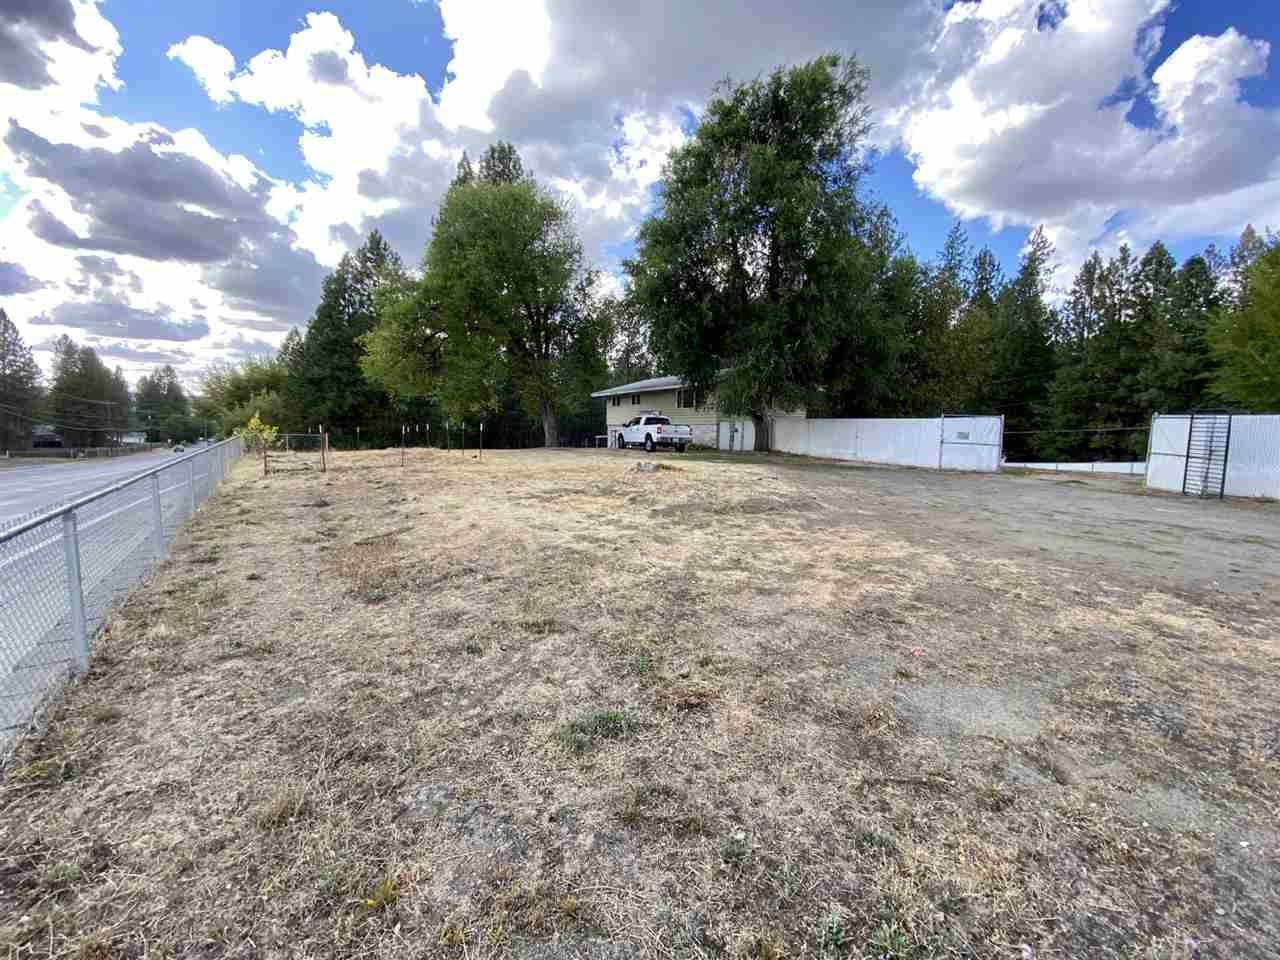 1307 E Hastings Rd, Spokane, WA 99218-1754 - #: 202023601